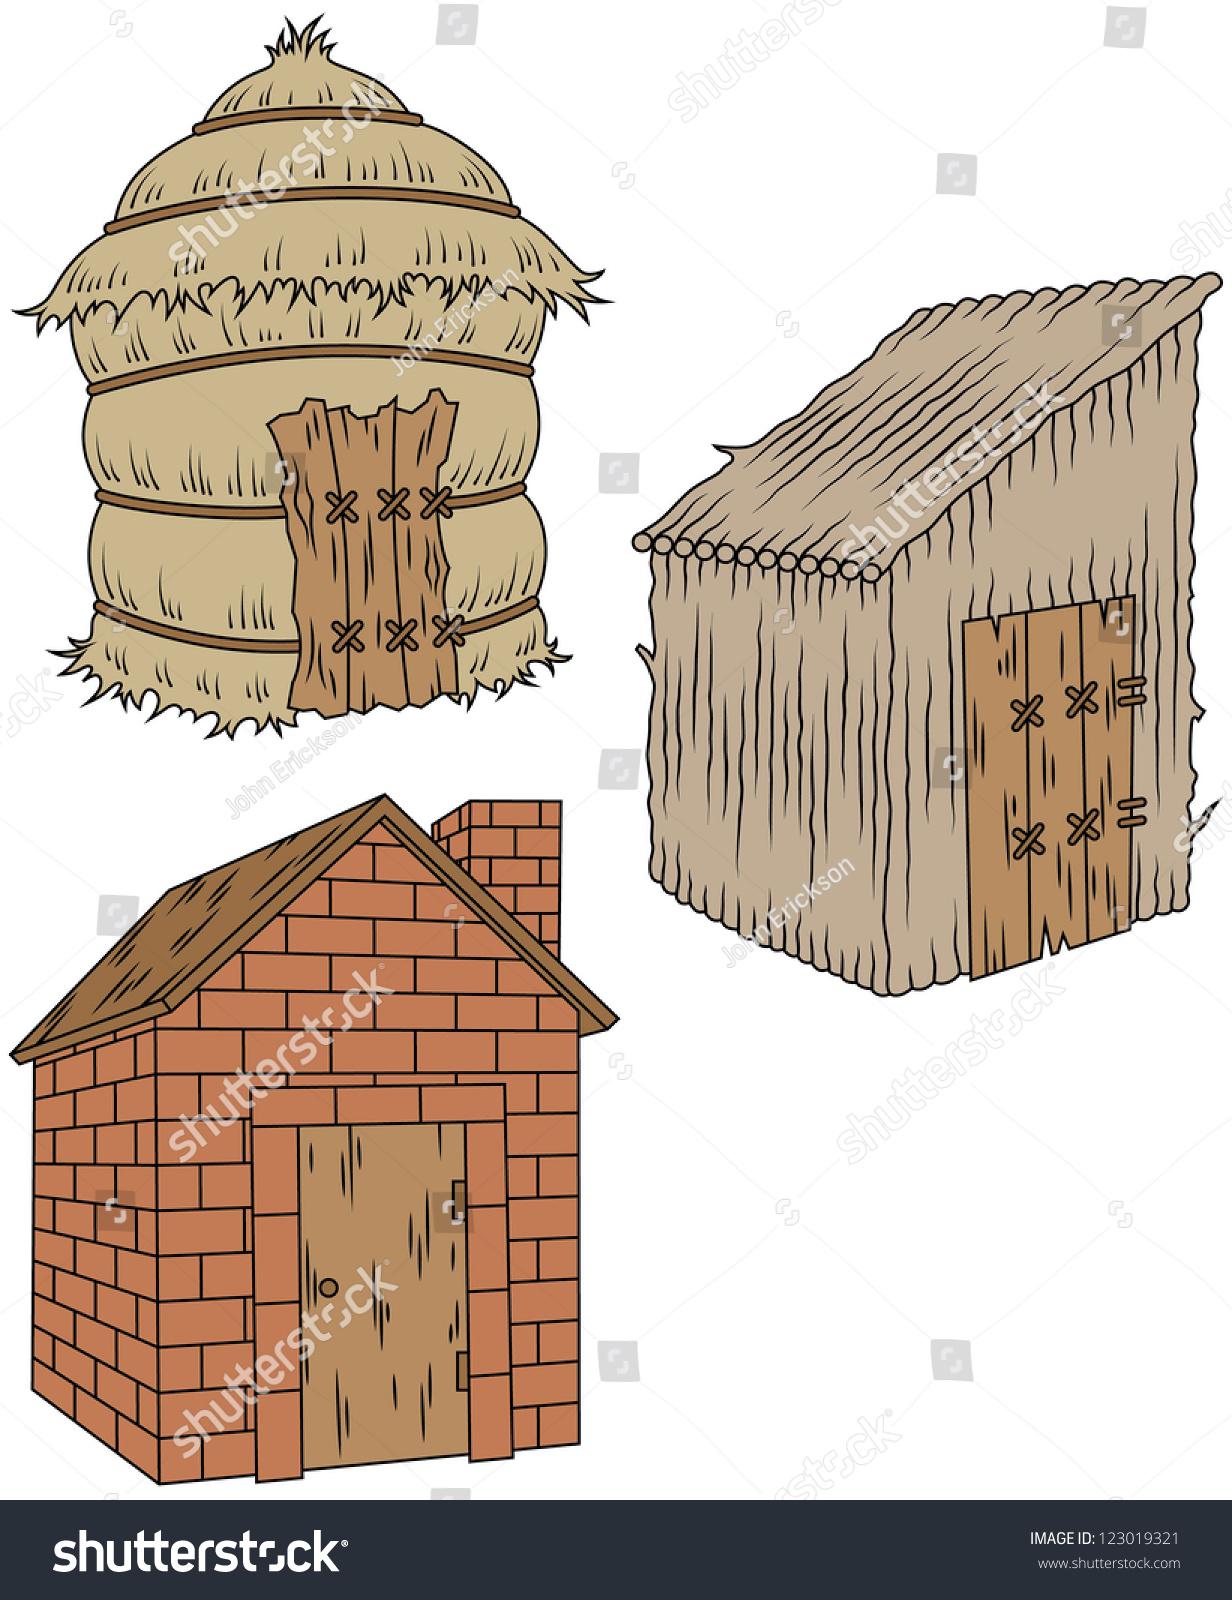 3 Pigs Houses Clipart - fedinvestonline